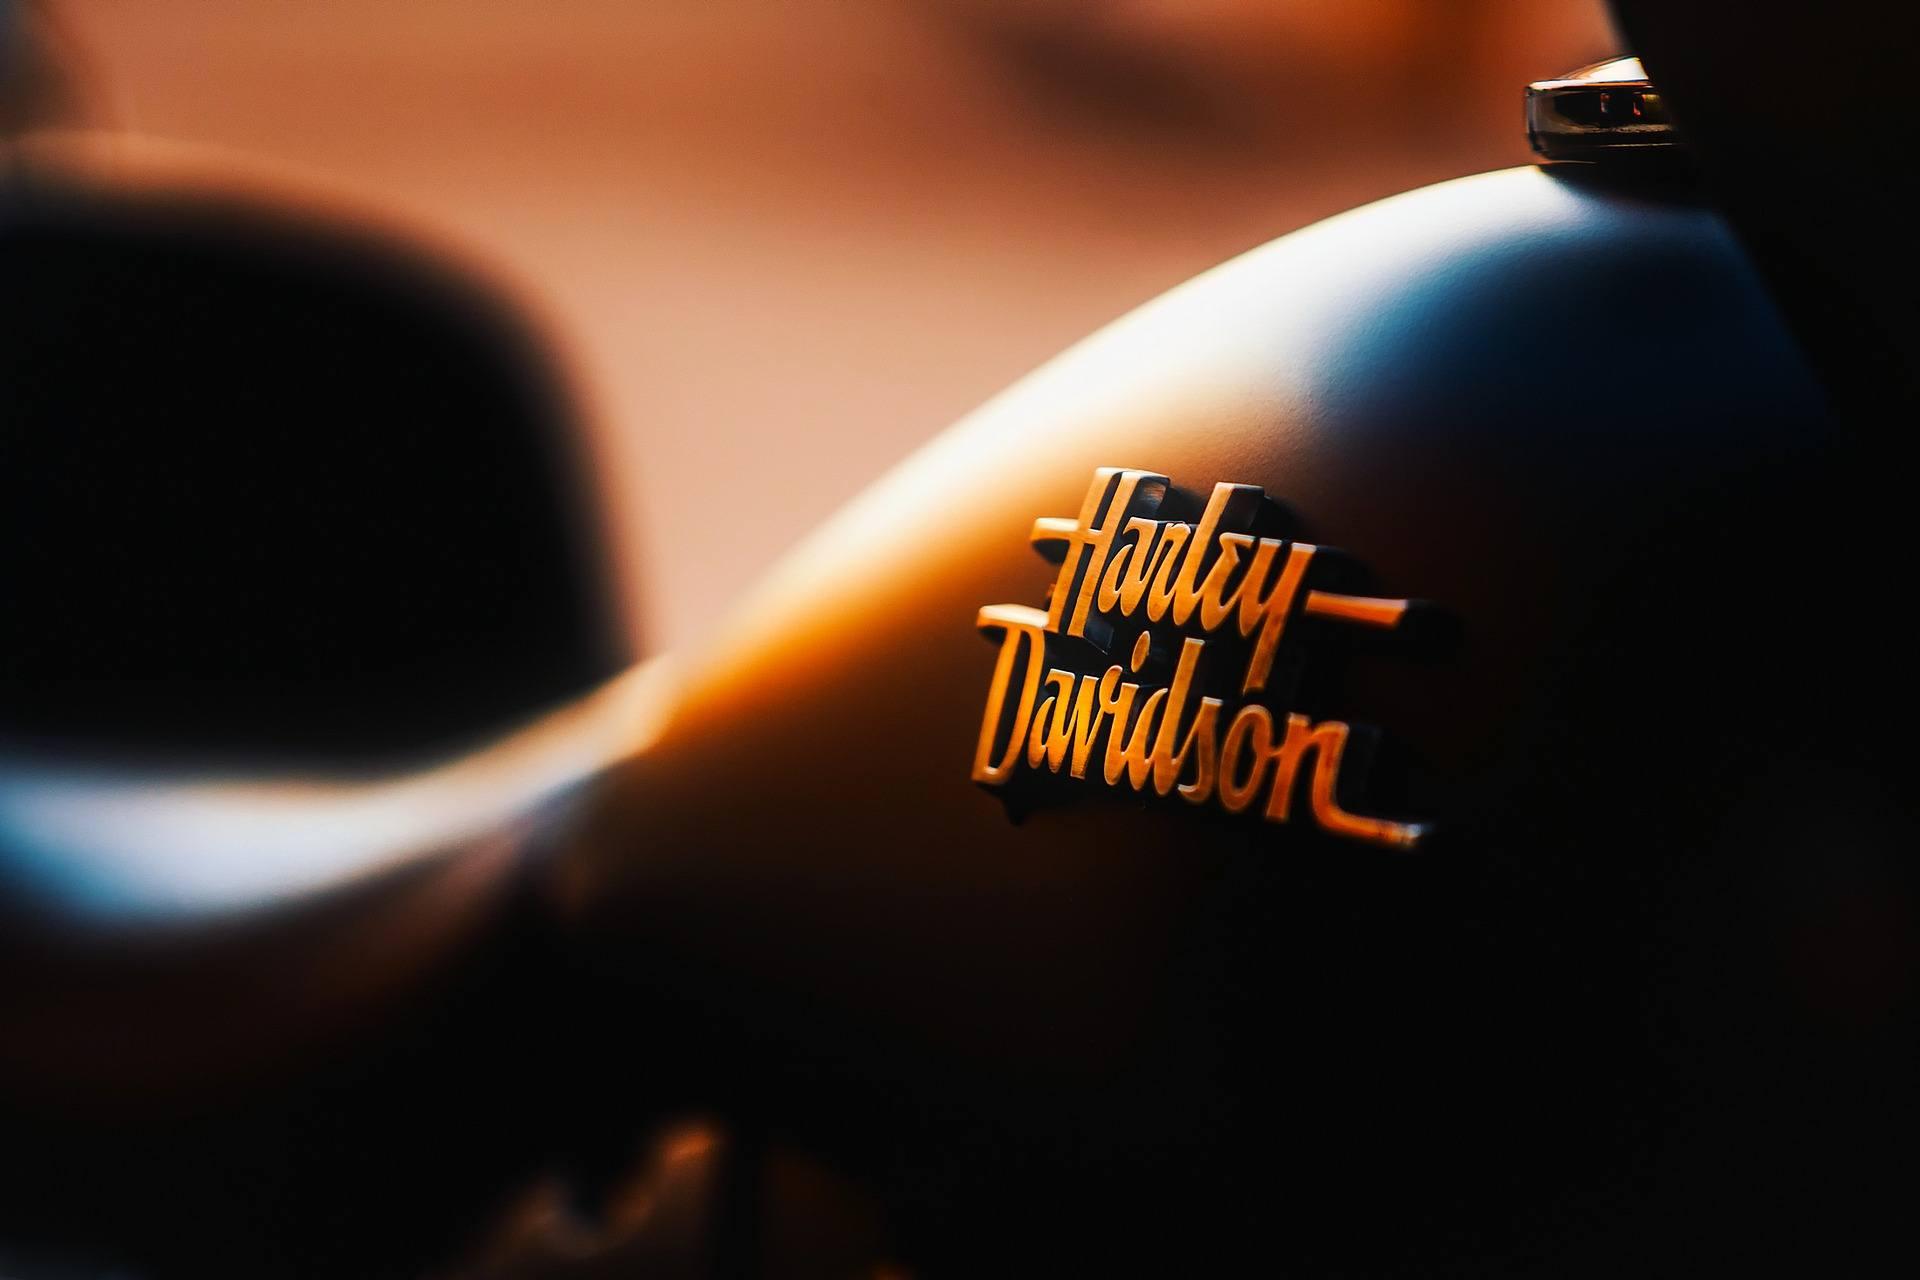 Harley-Davidson, Inc. (HOG) Given Hold Rating at Jefferies Group LLC